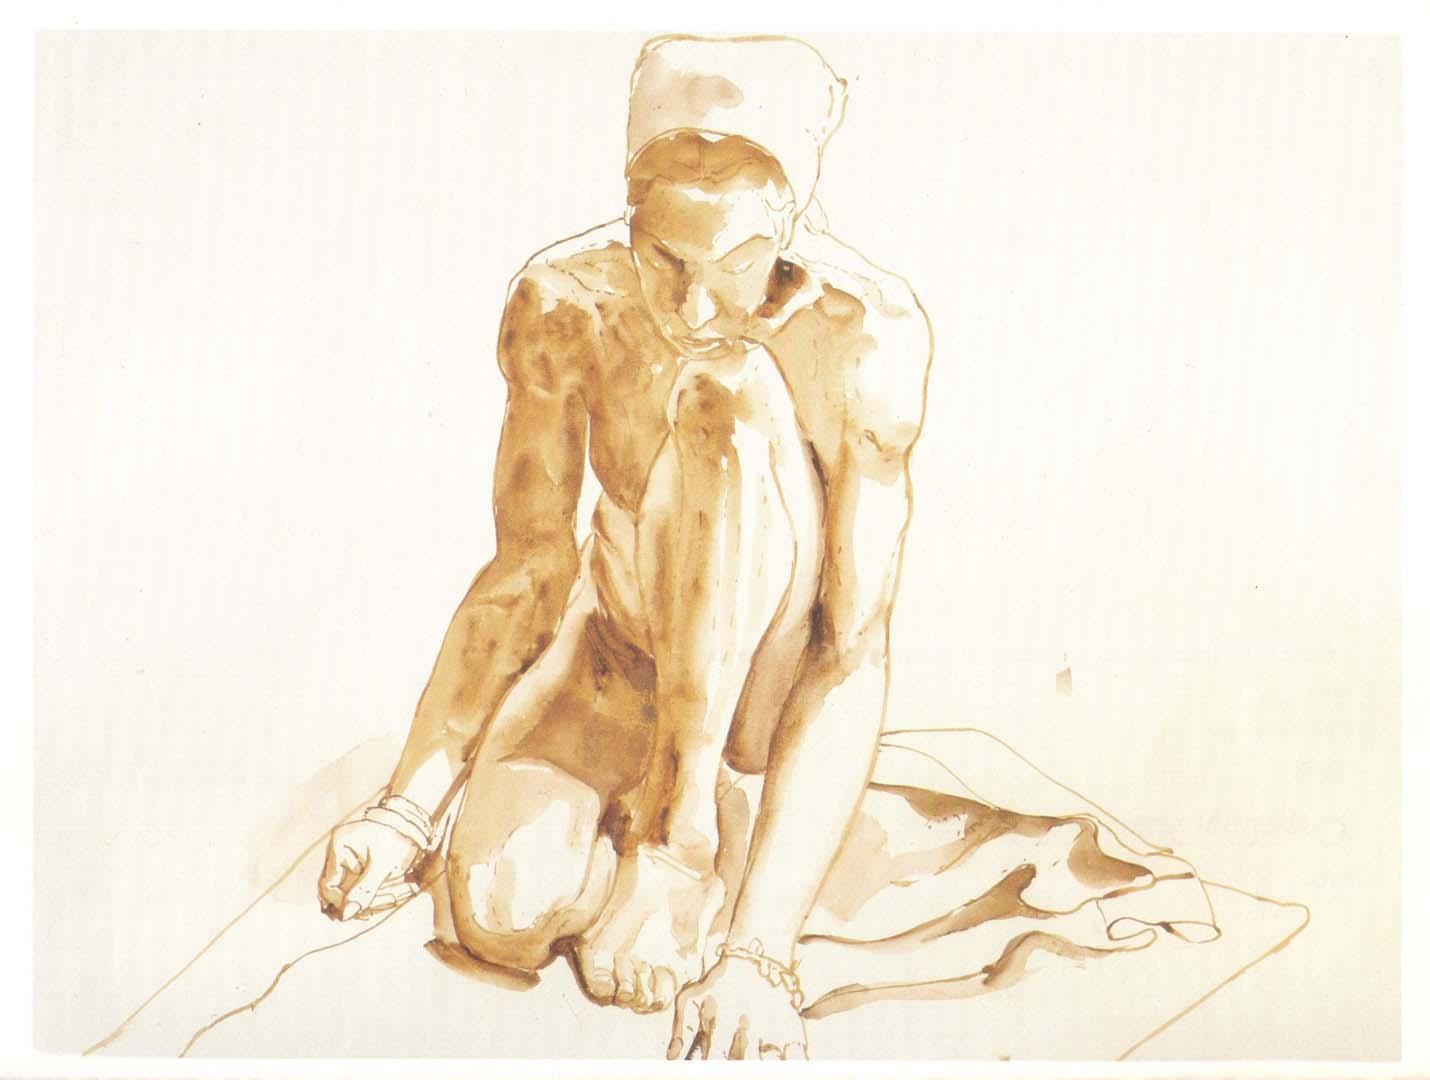 1967 Kneeling Figure Sepia Wash on Paper 22 x 30